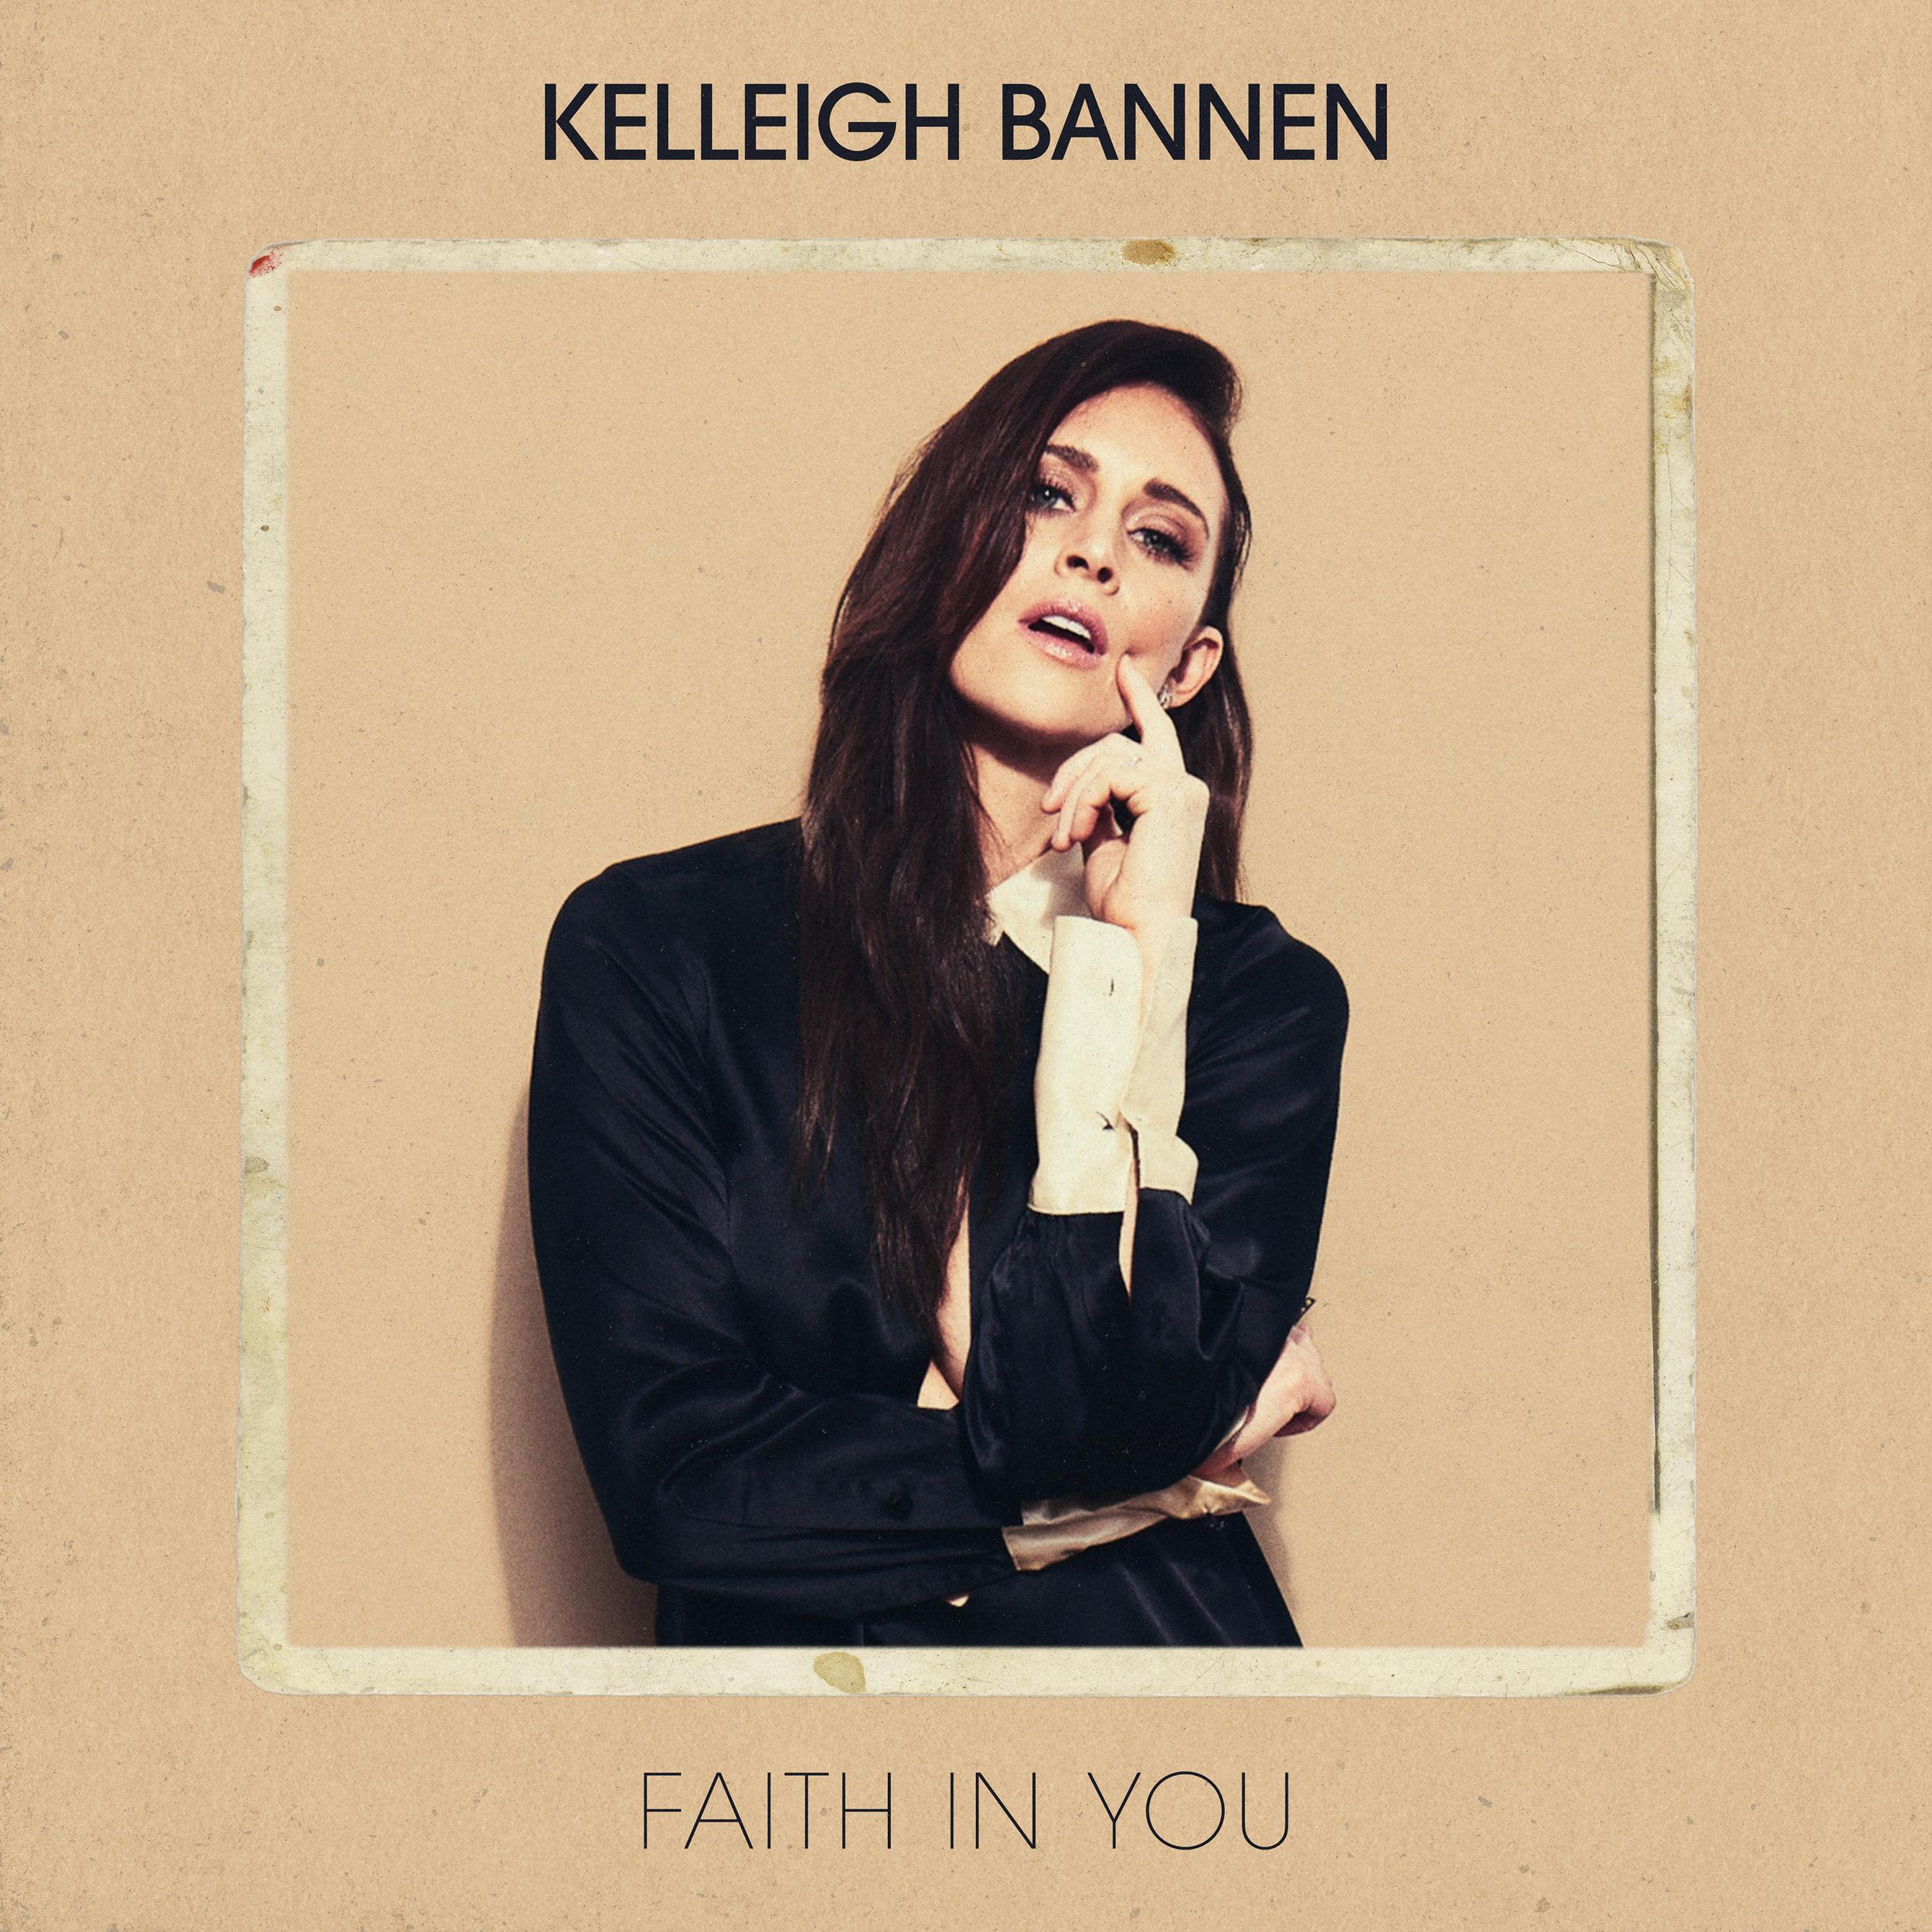 KELLEIGH_BANNEN-FAITH_IN_YOU.jpg